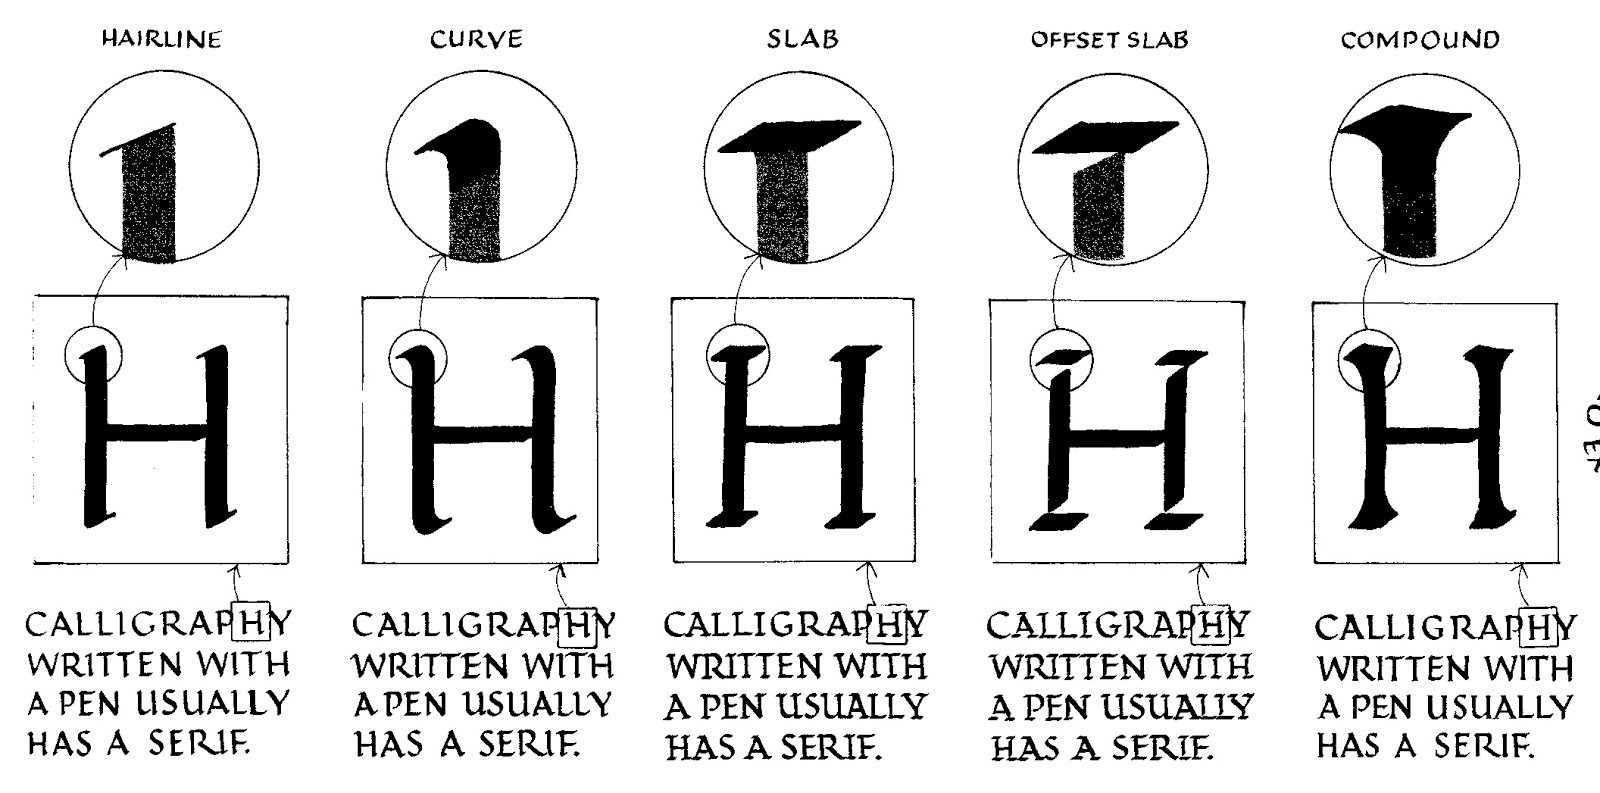 Margaret Shepherd Calligraphy Blog Five Serif Techniques